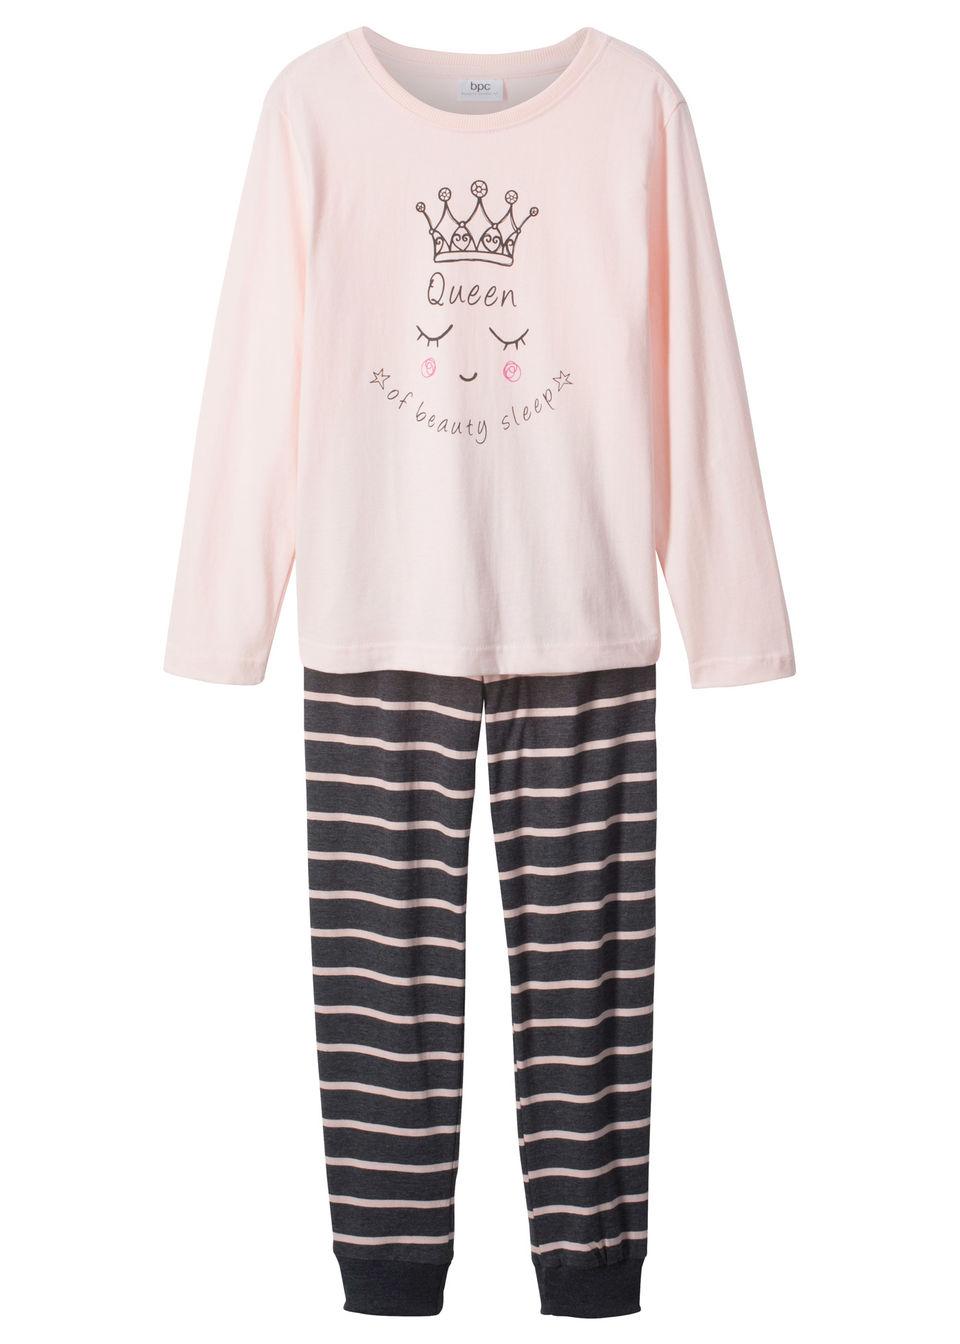 Пижама для девочки (2 изд.) от bonprix